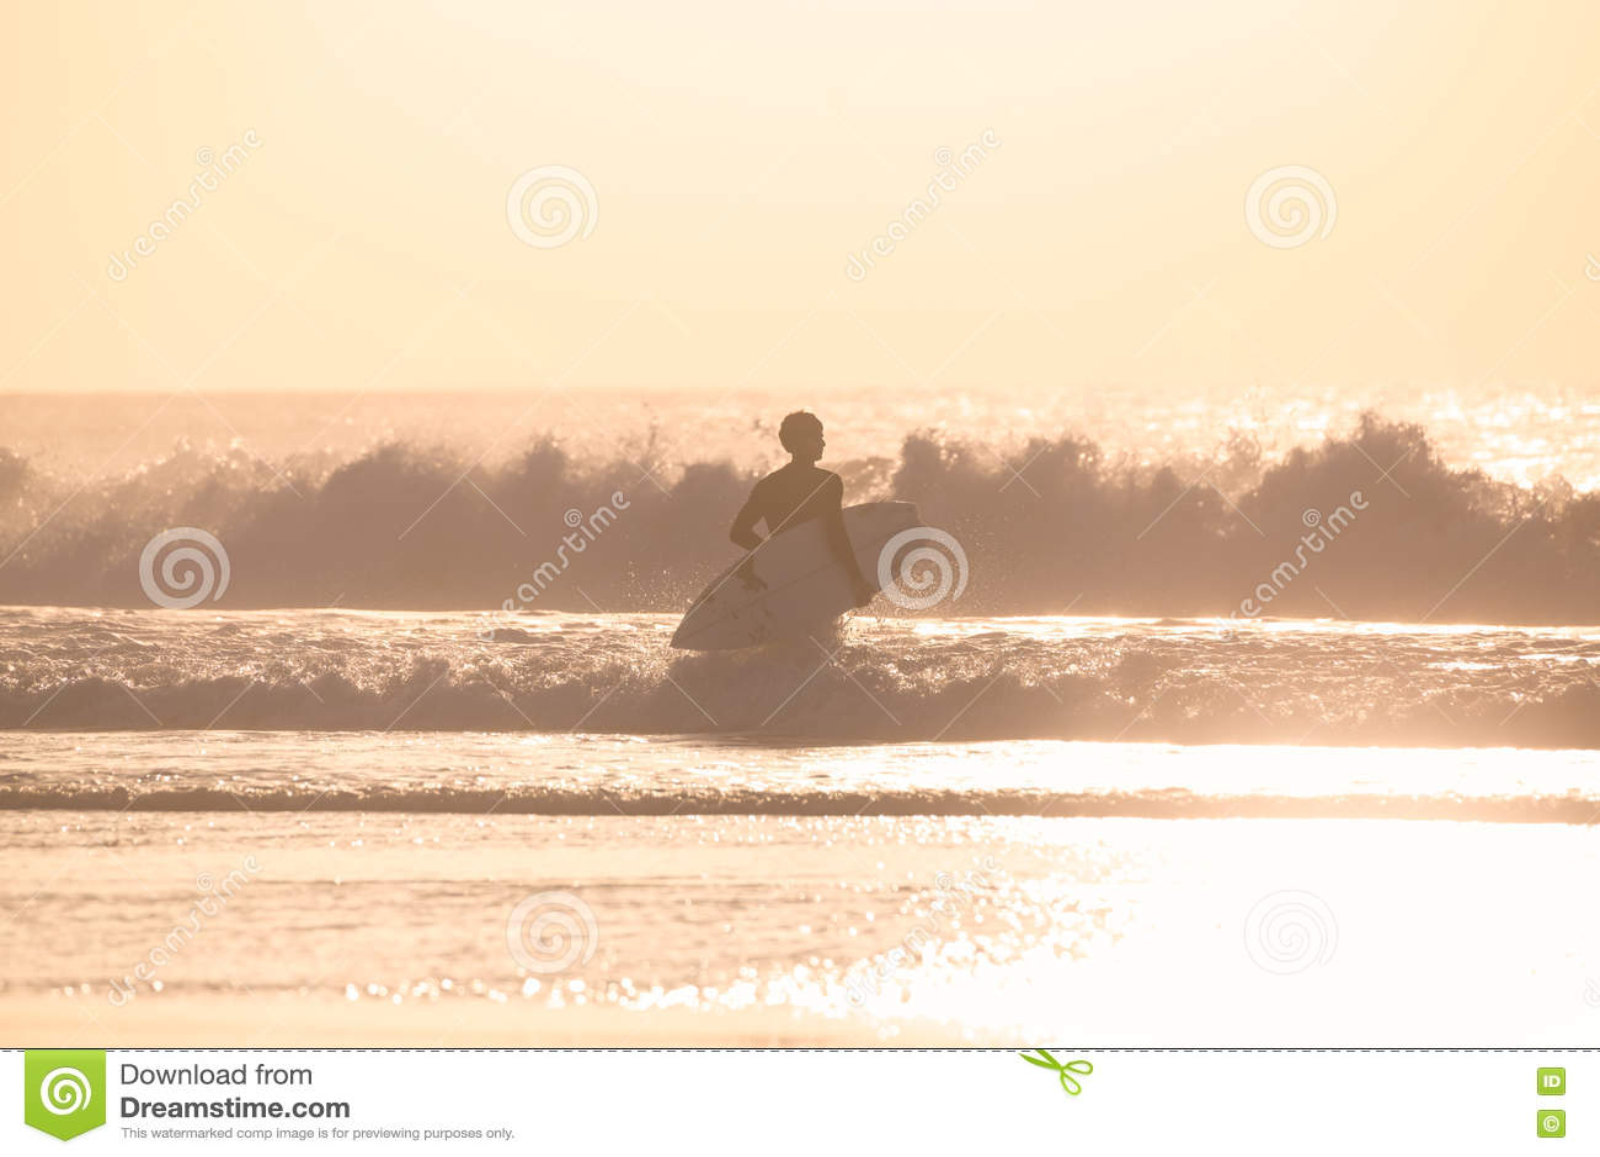 Surfistas na praia com prancha